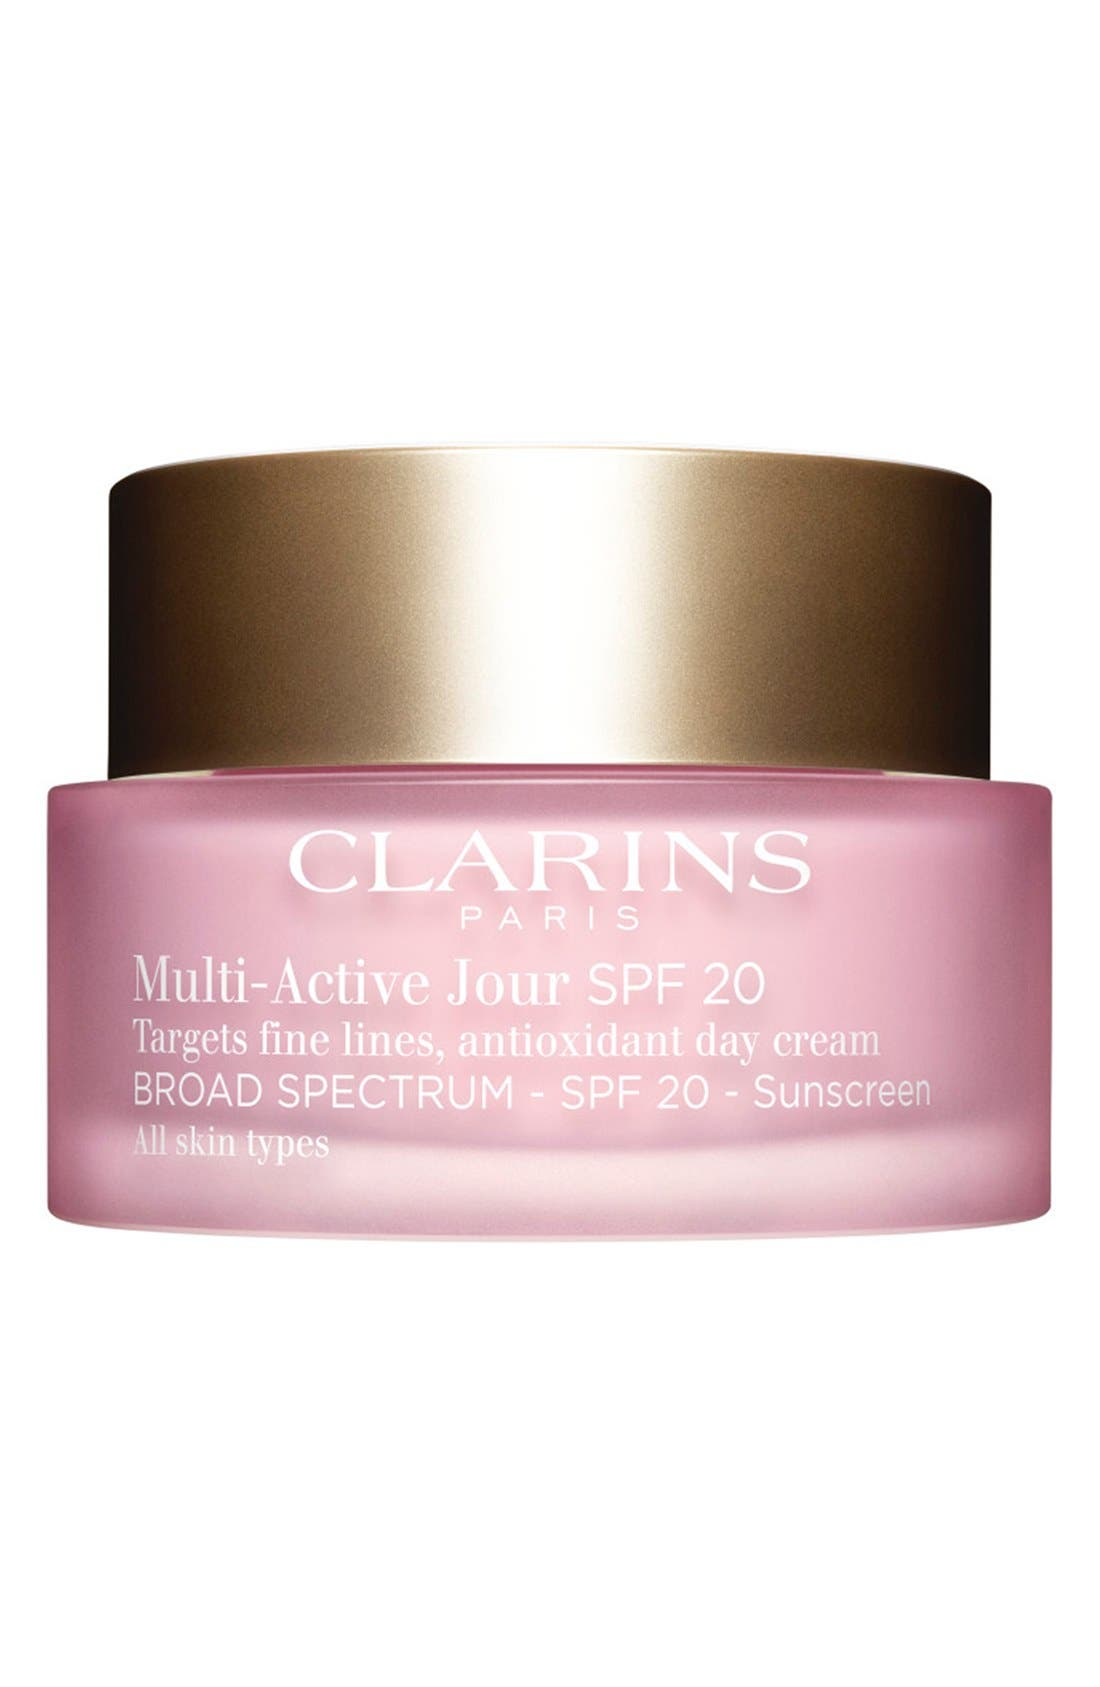 Clarins Multi-Active Day Cream SPF 20